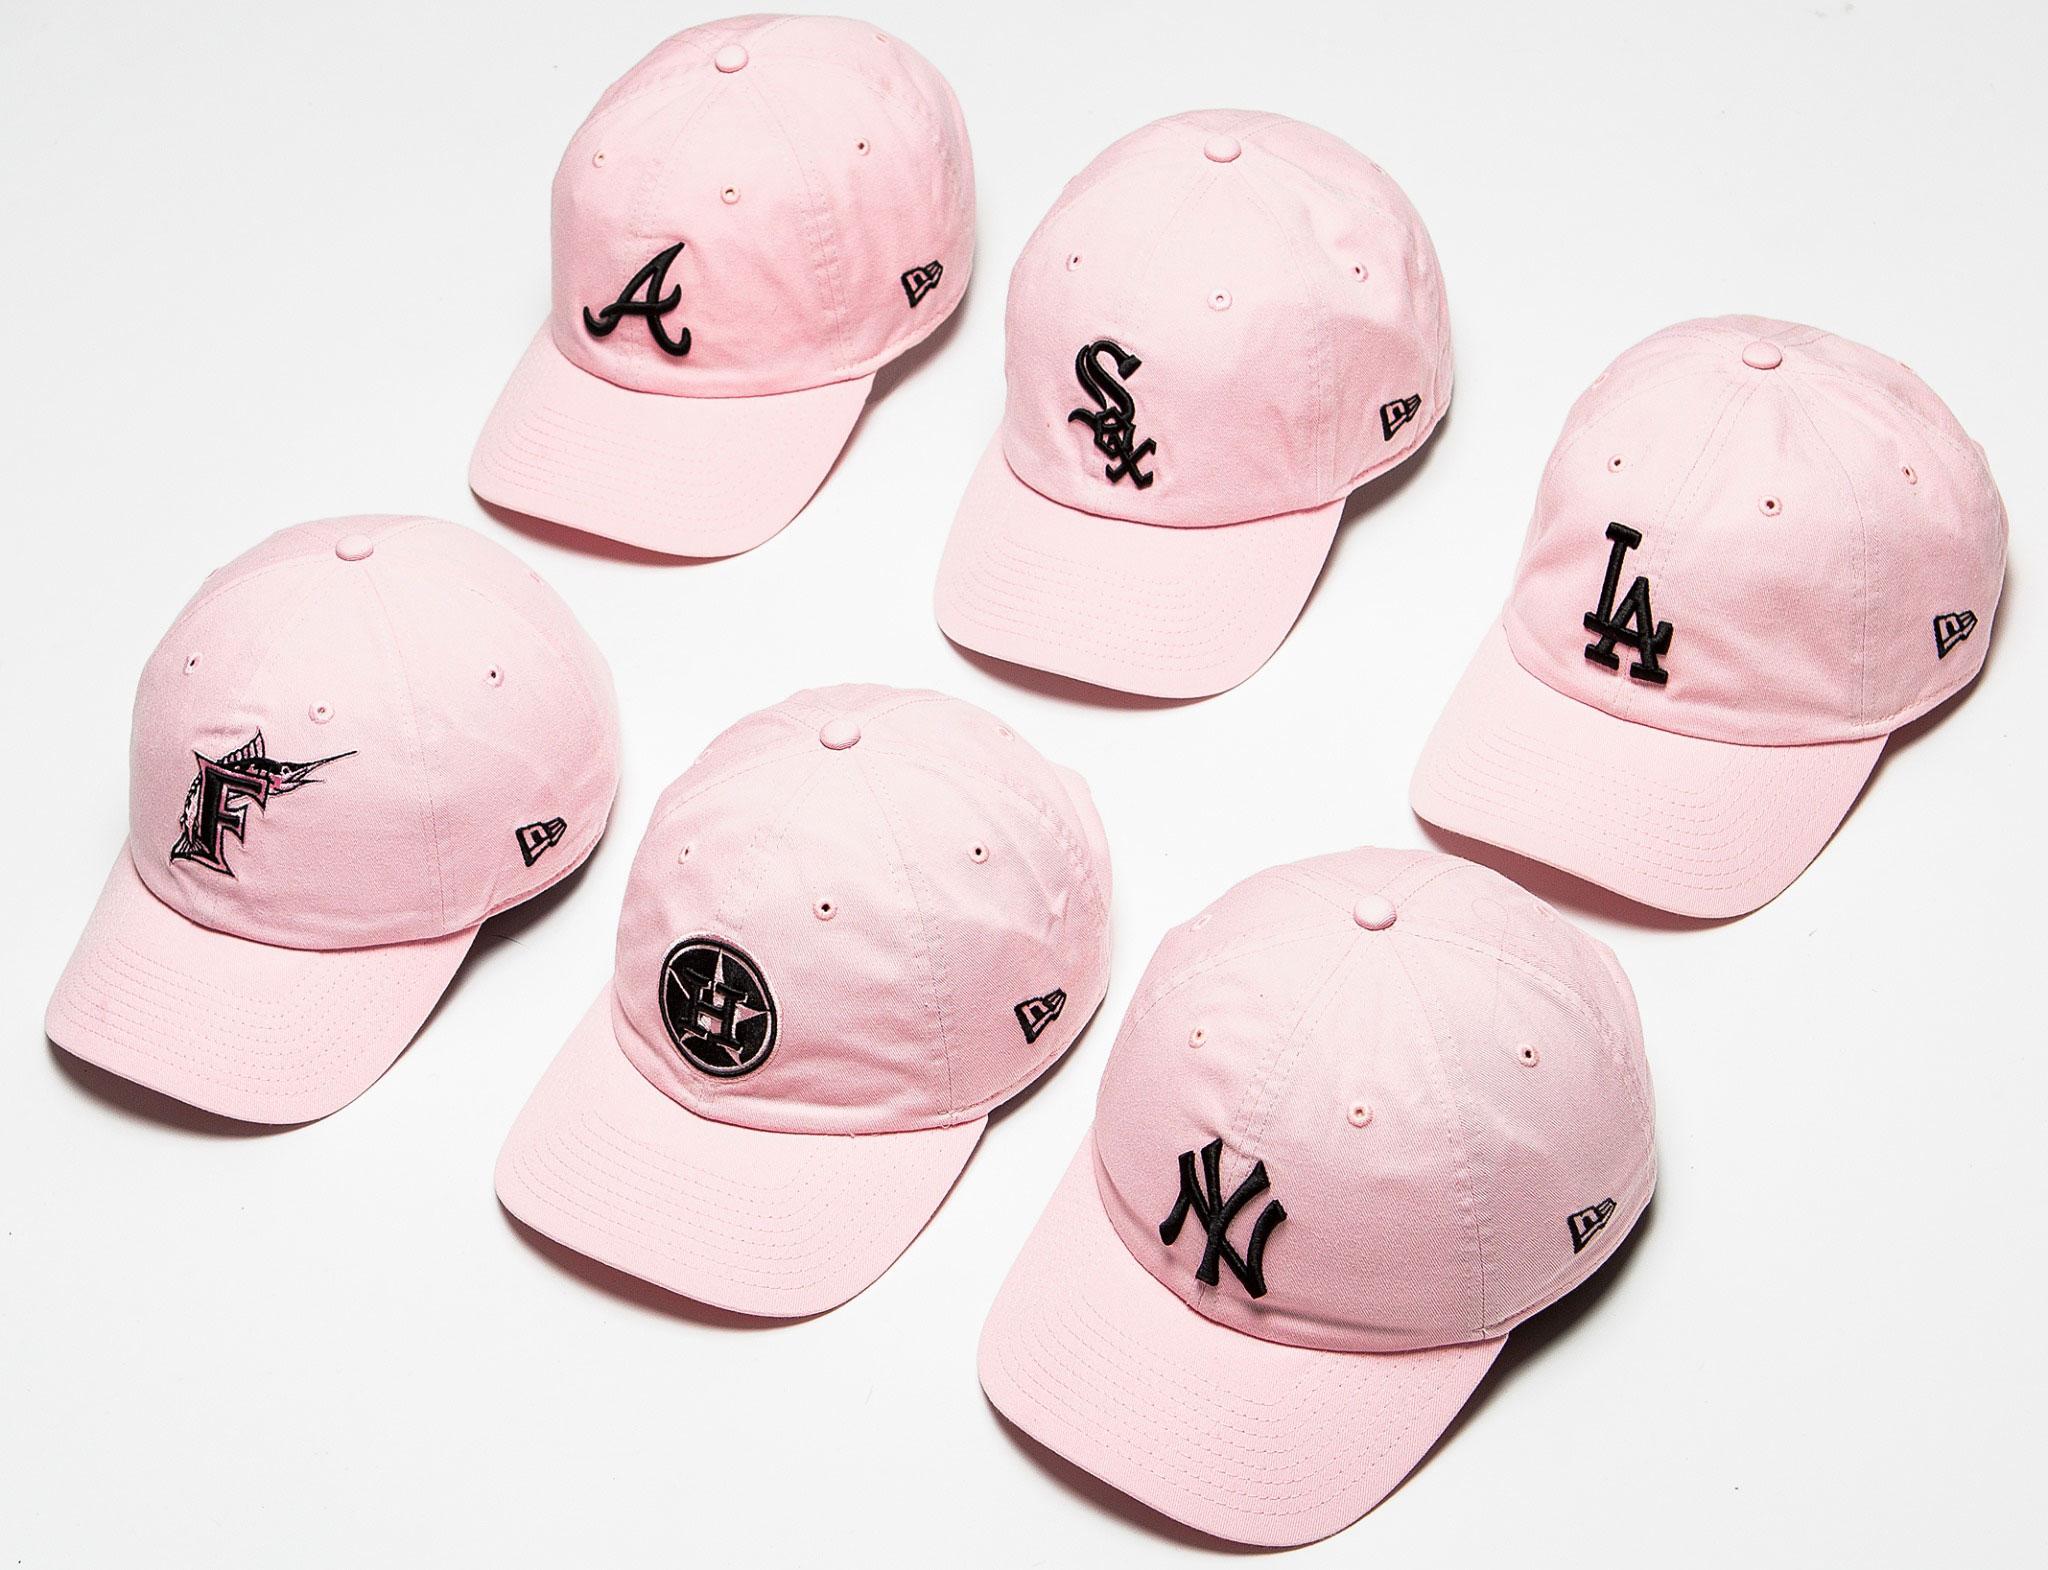 jordan-7-hare-pink-hats